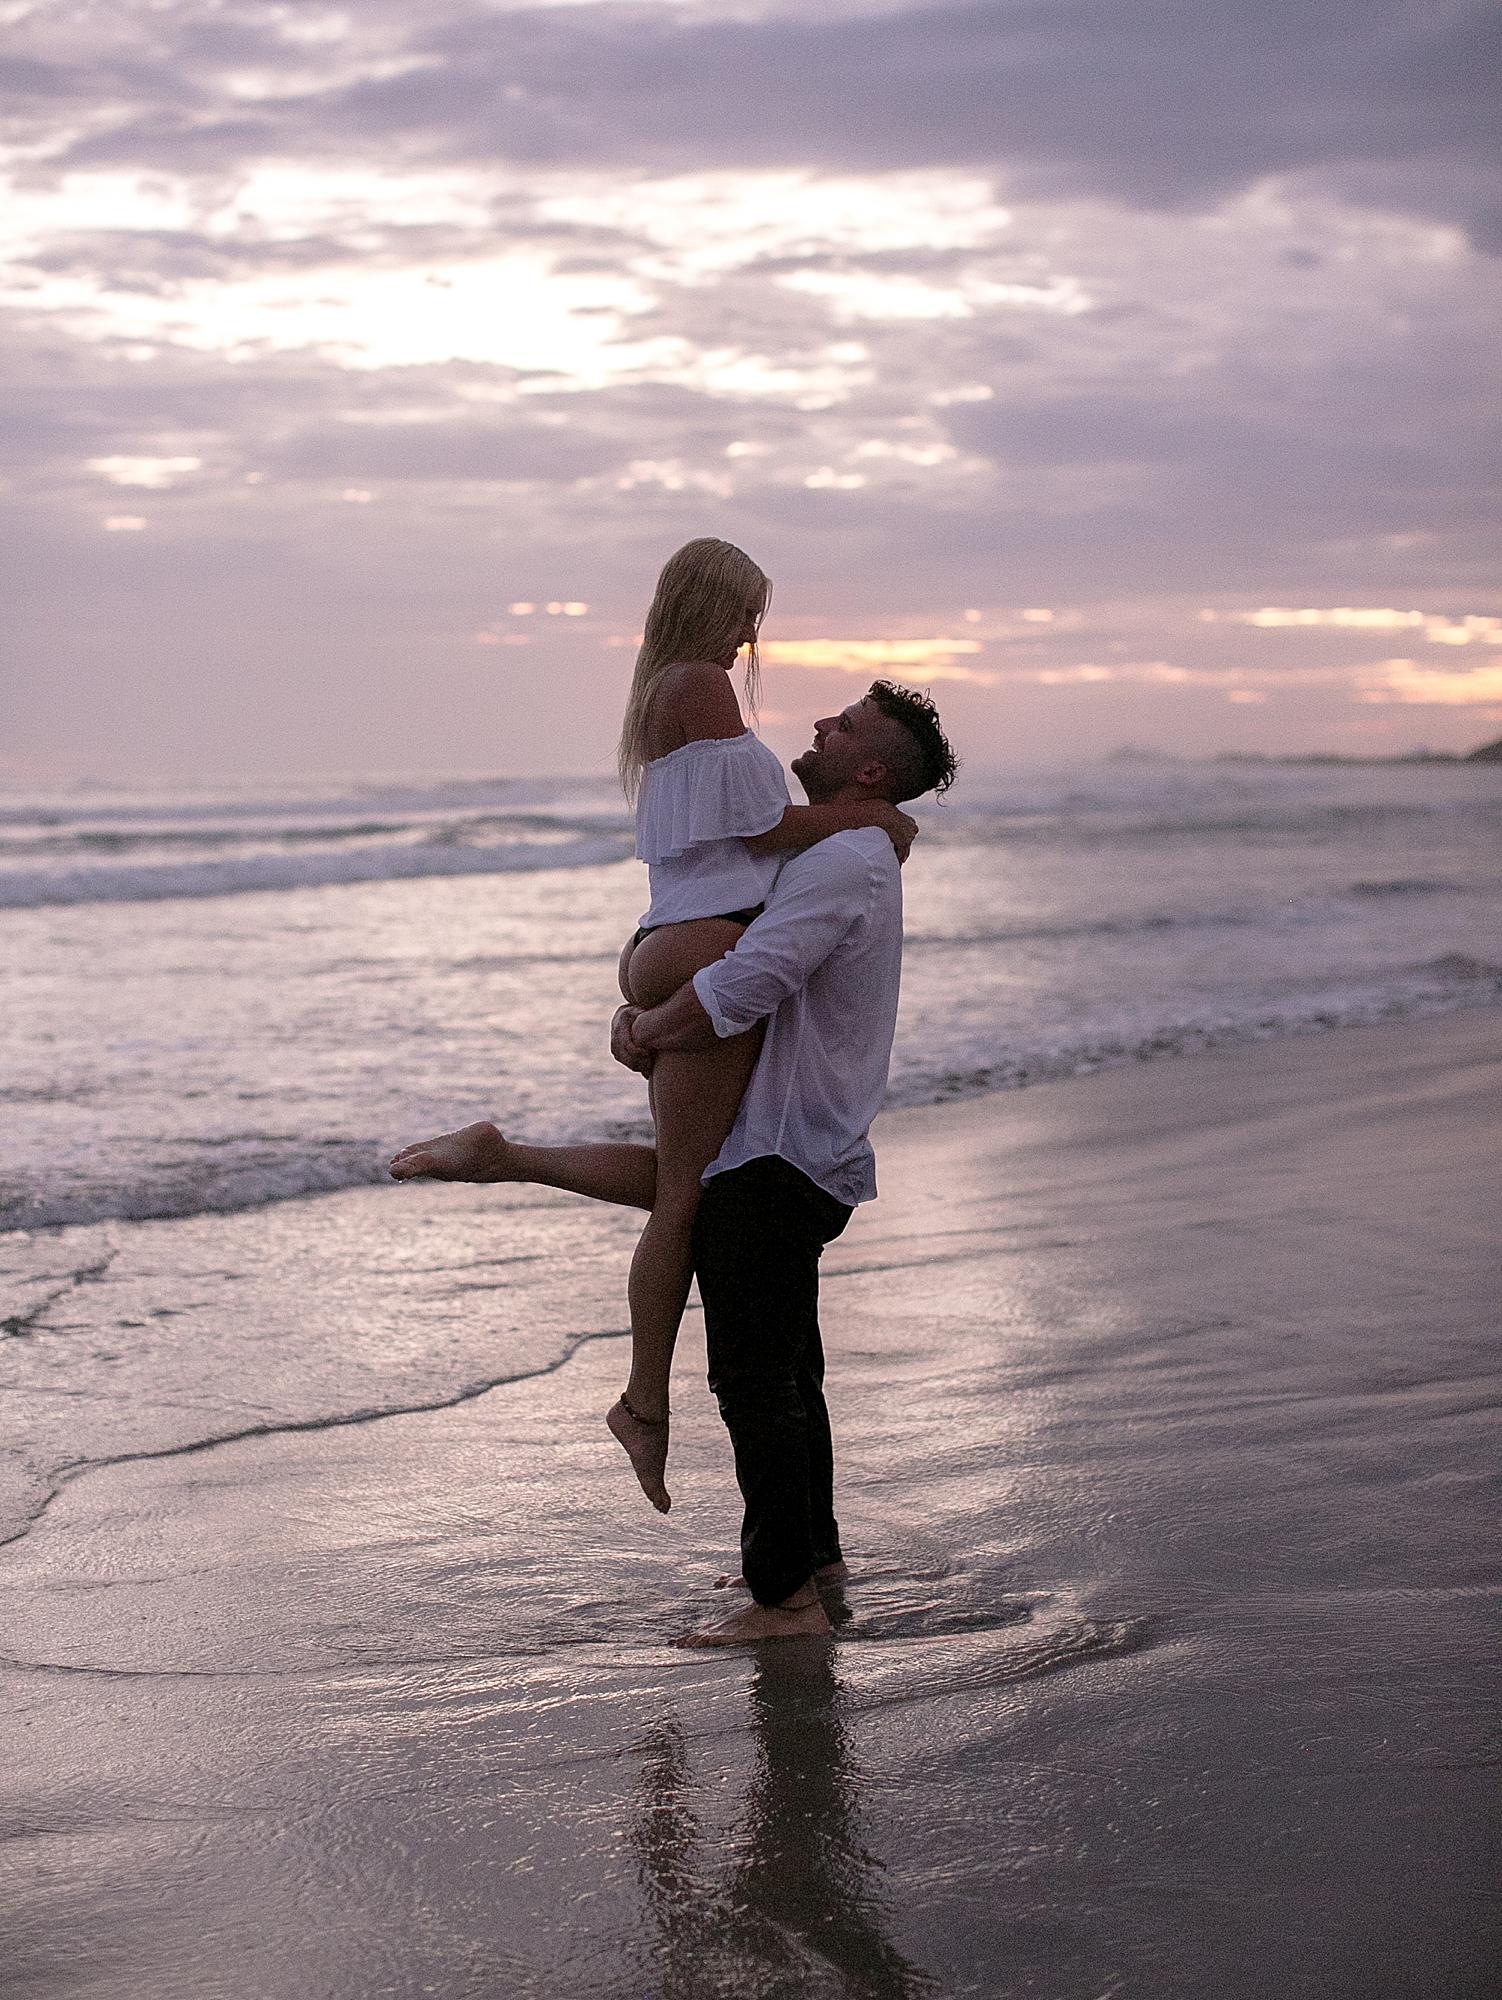 Epic and Adventurous Travel Wedding and Portrait Photographer in Nosara, Costa Rica - Kelee Bovelle @xokelee @keleeb - 35.jpg